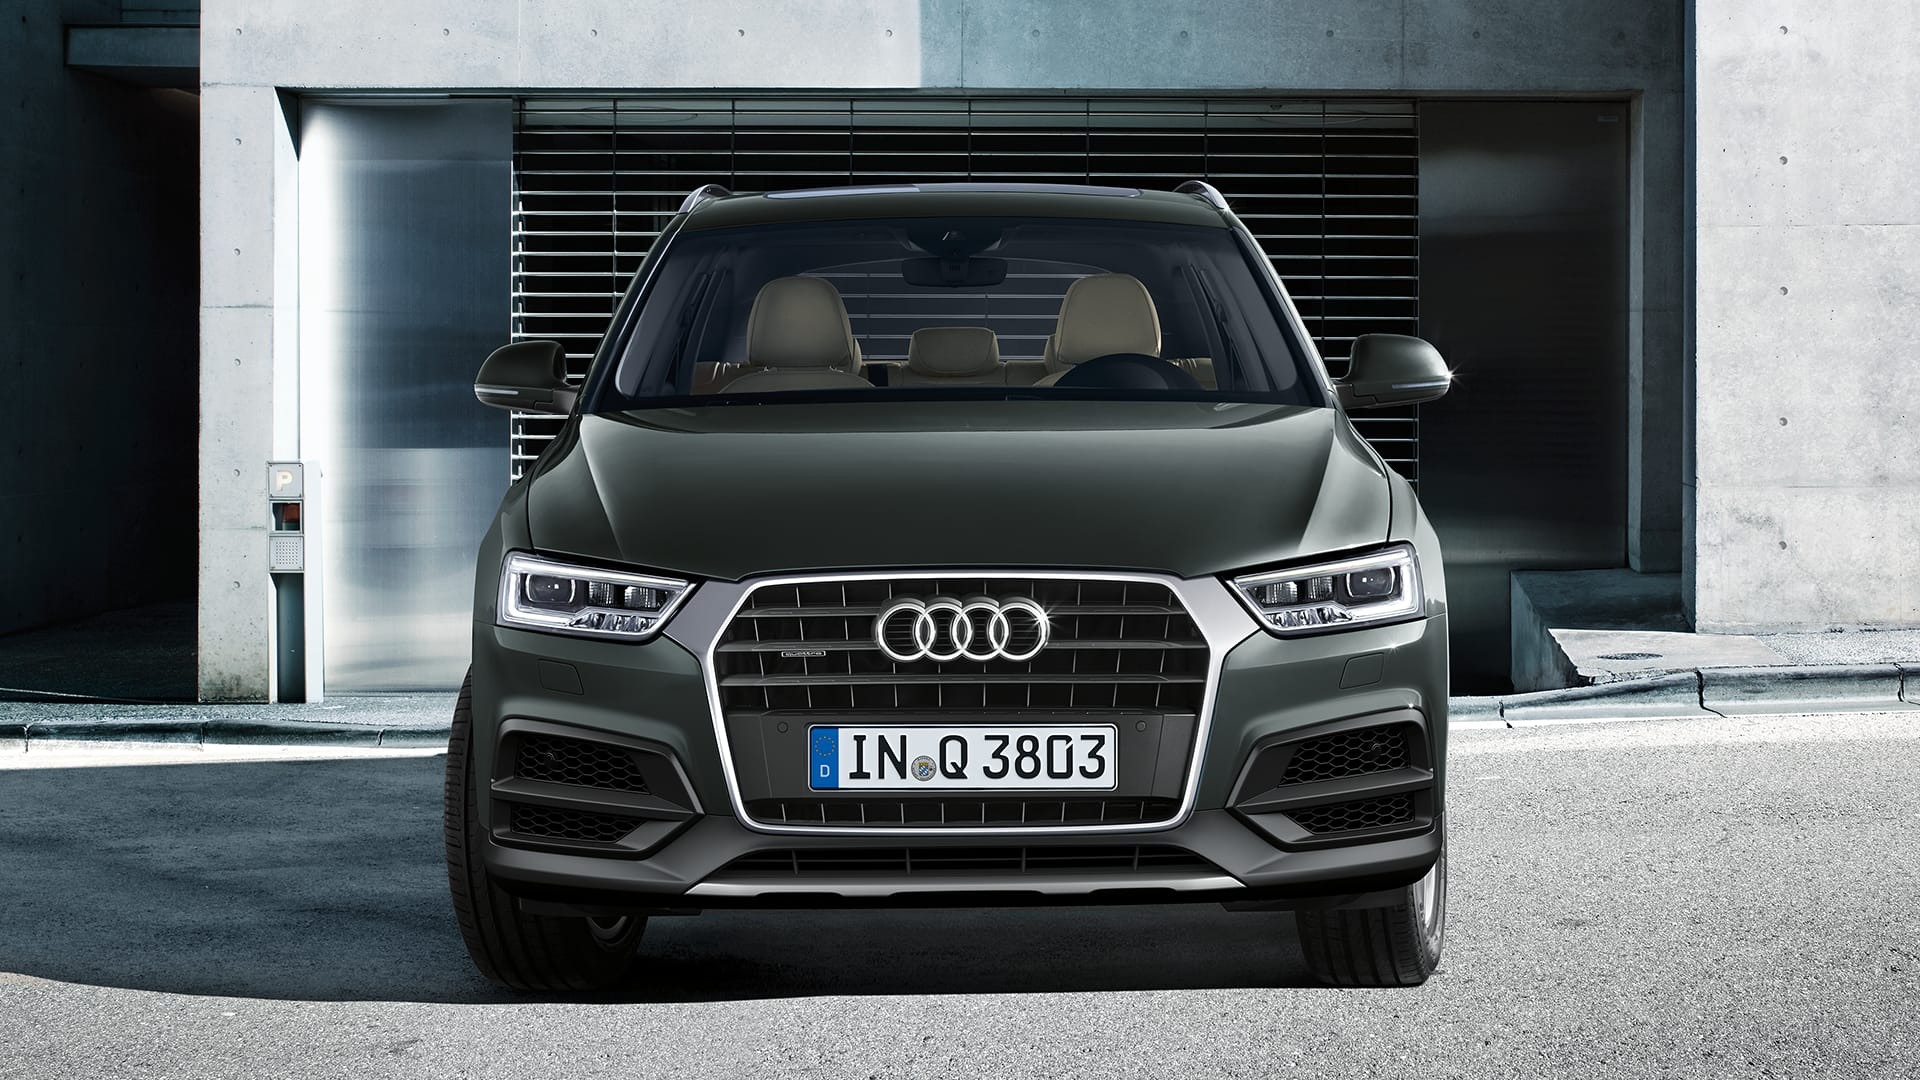 The Audi Q3